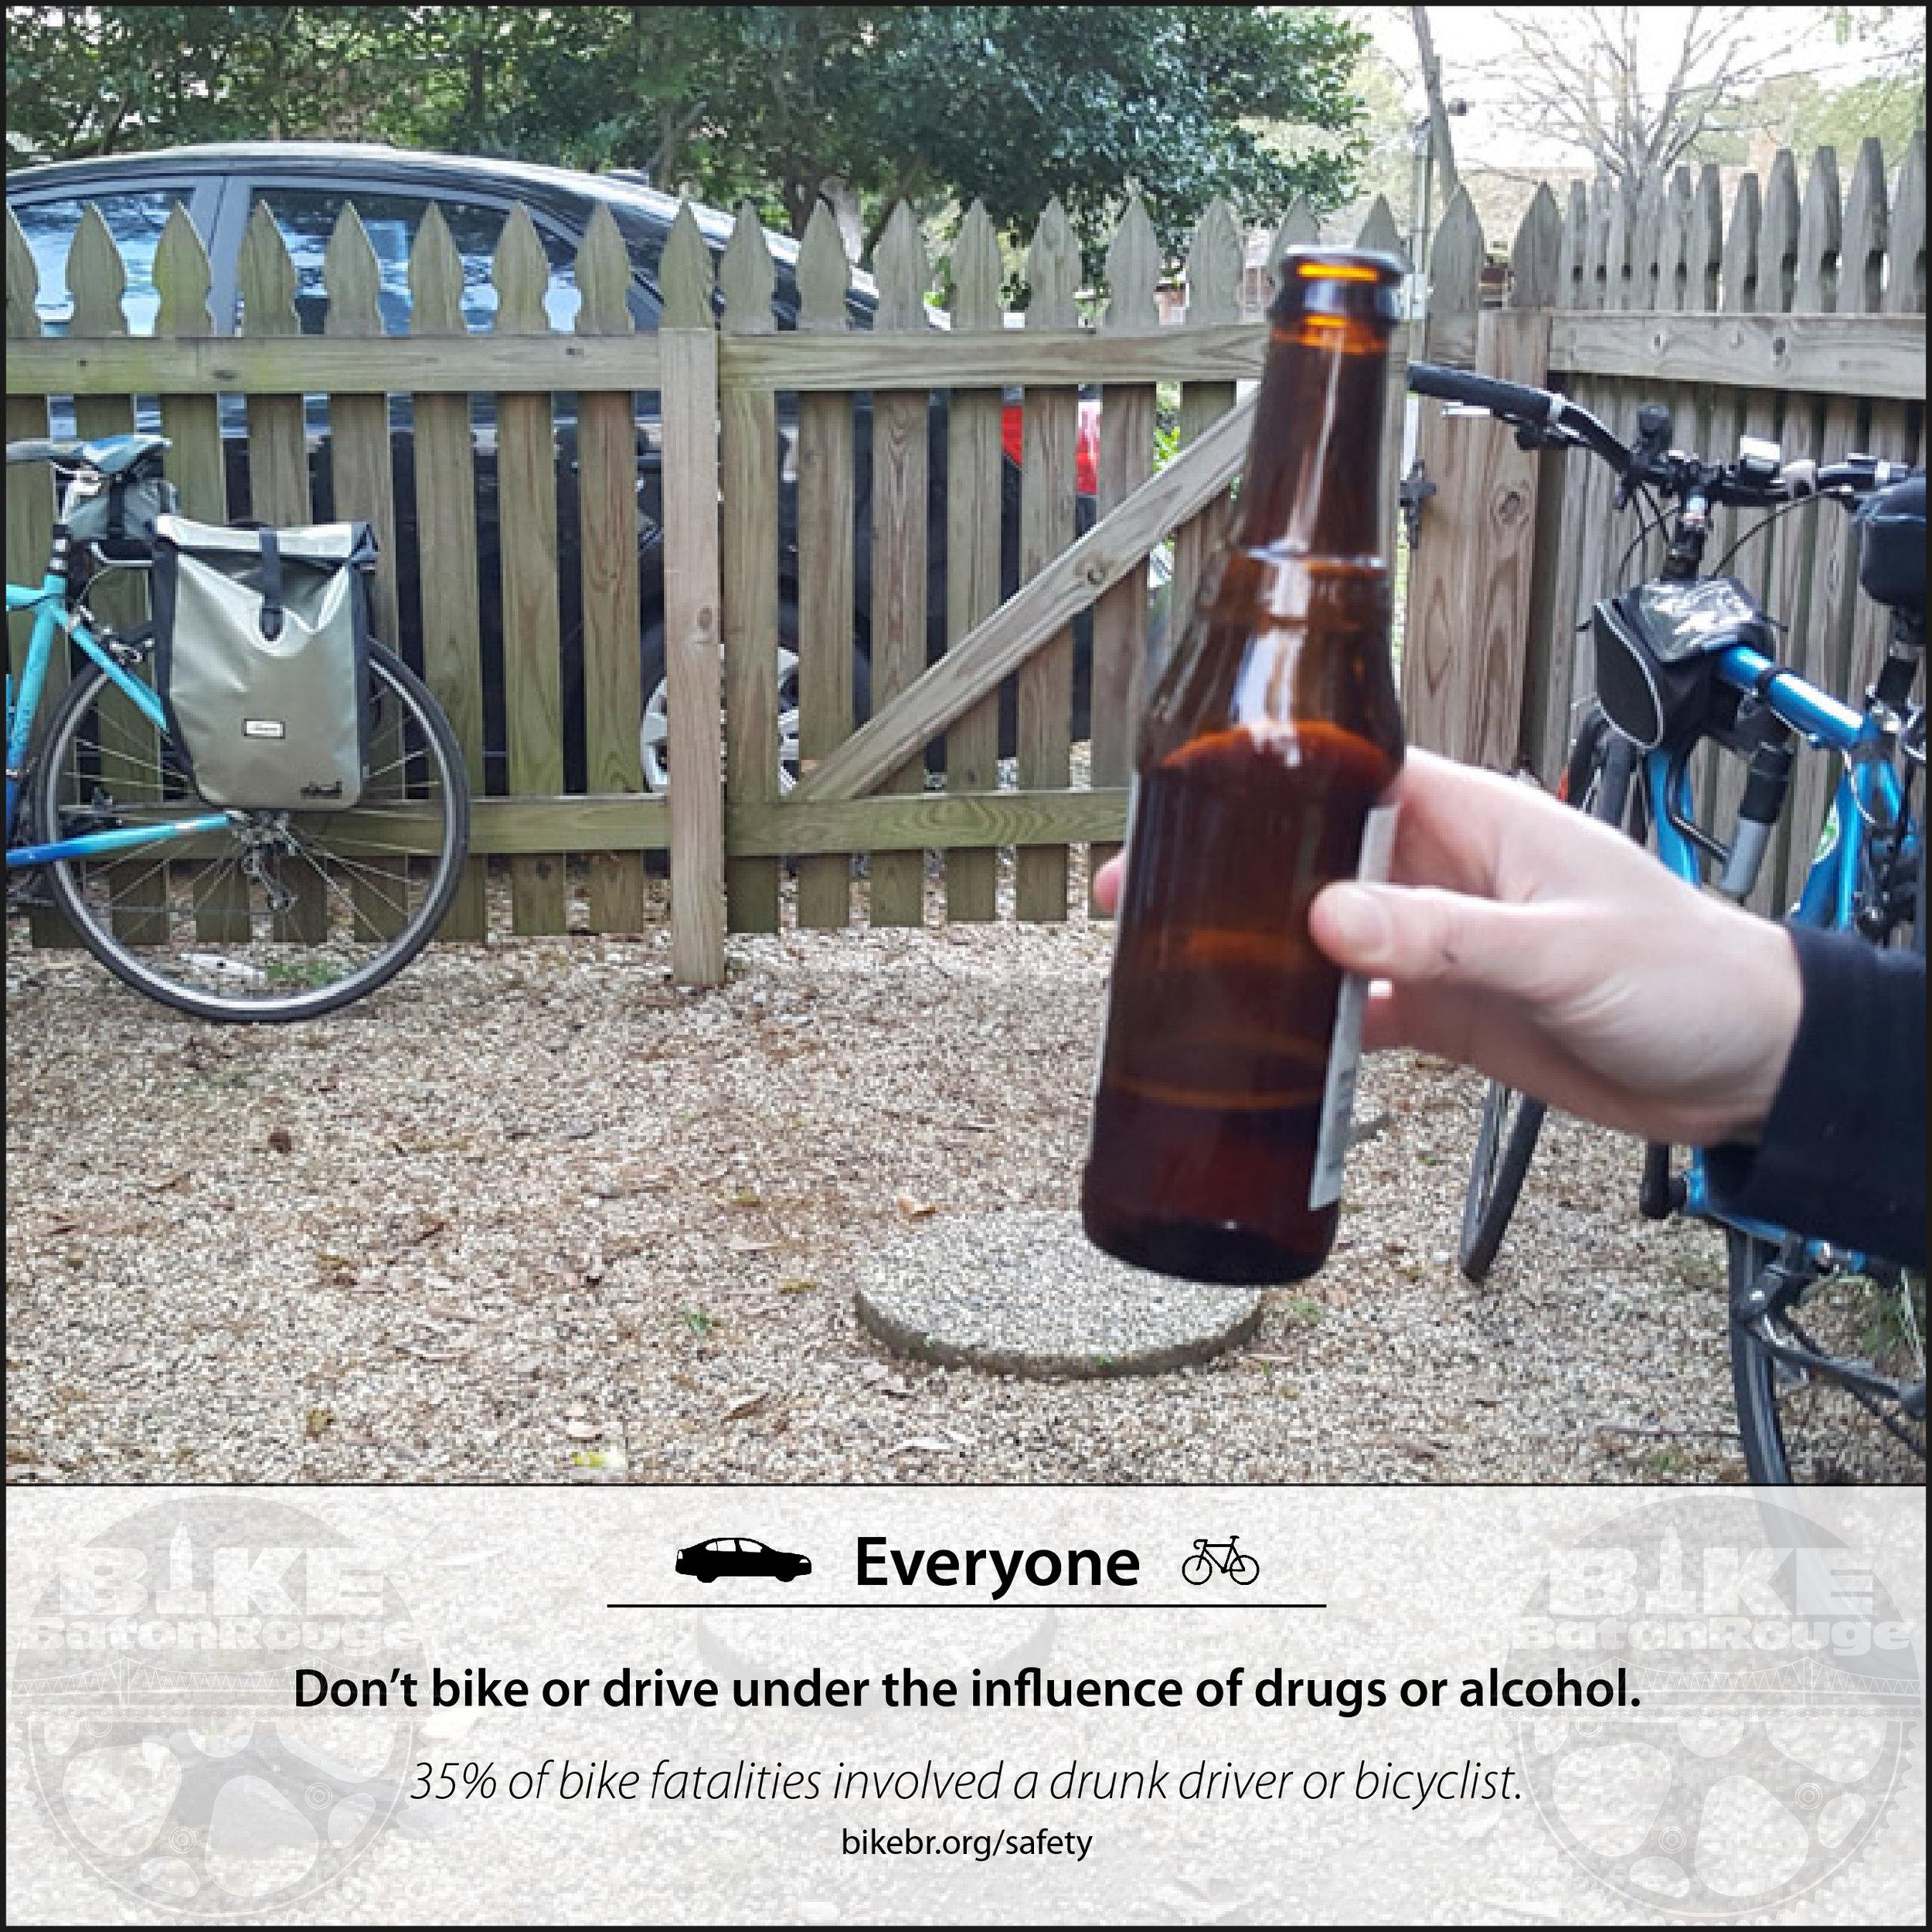 SpringSafety_drinking-01.jpg